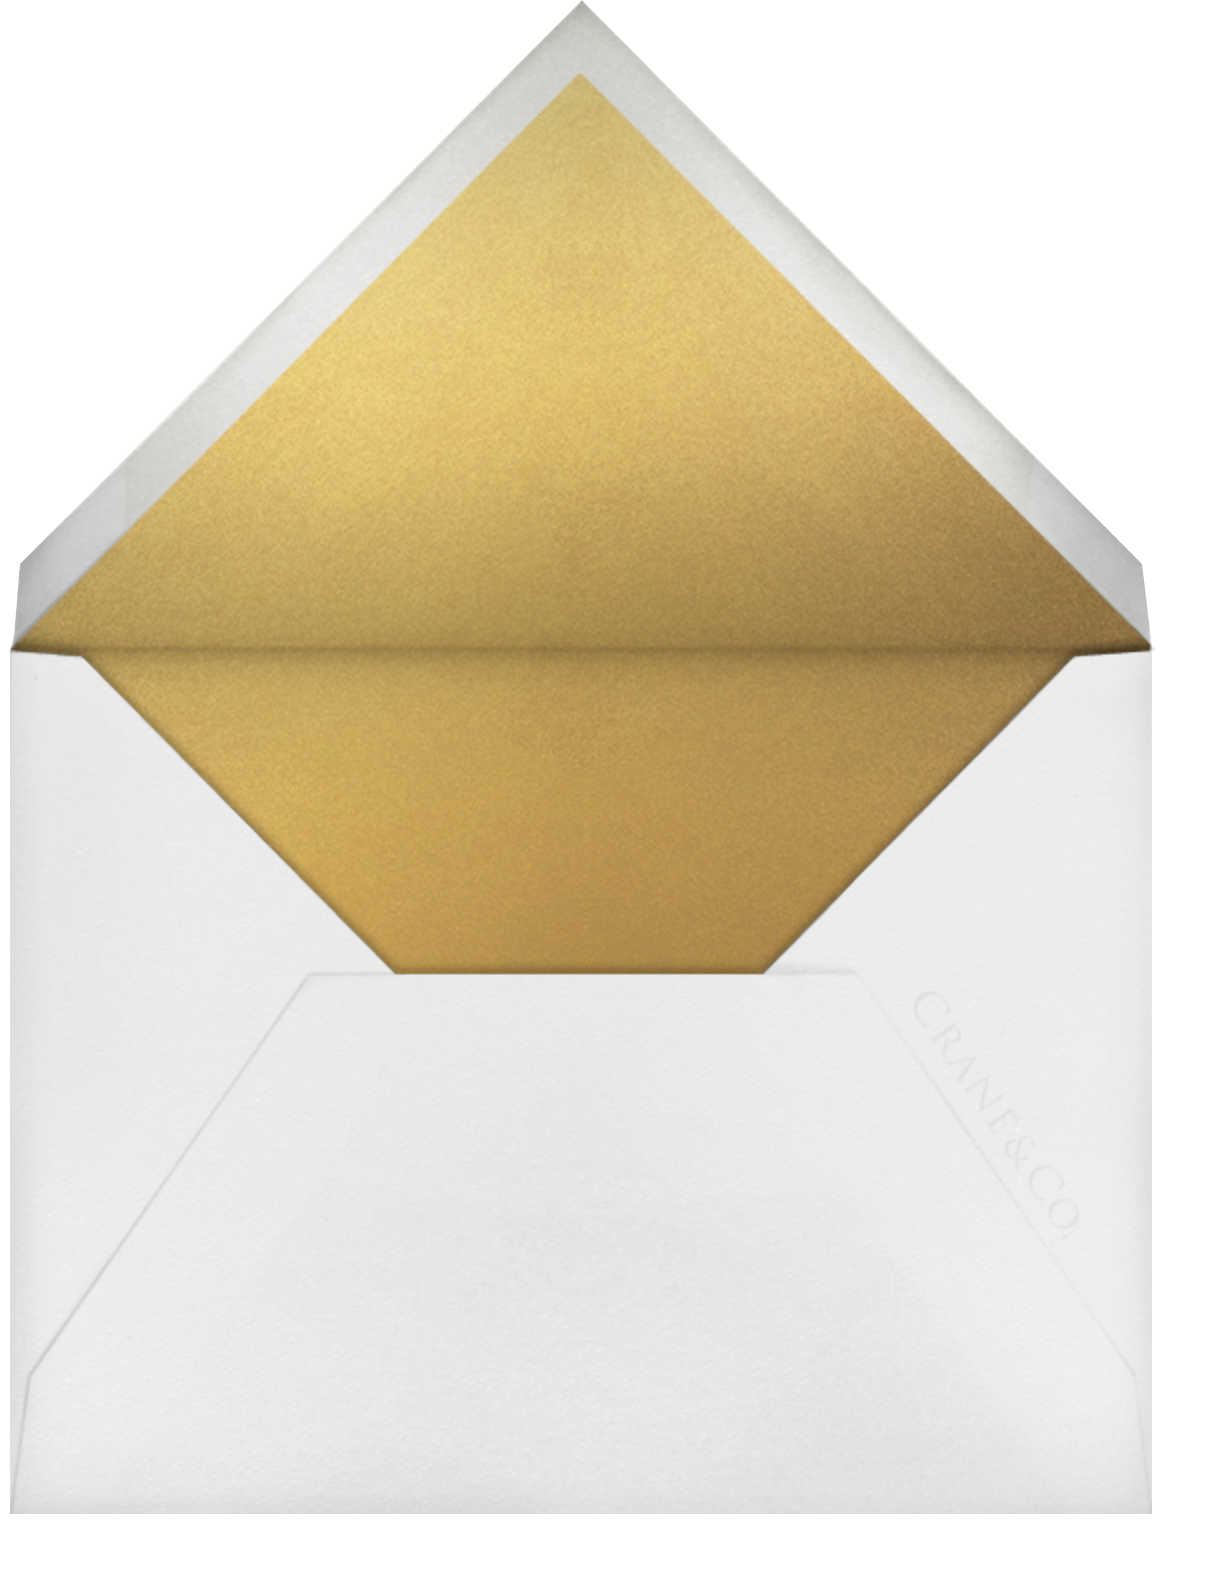 Spindle - Gold - Vera Wang - All - envelope back